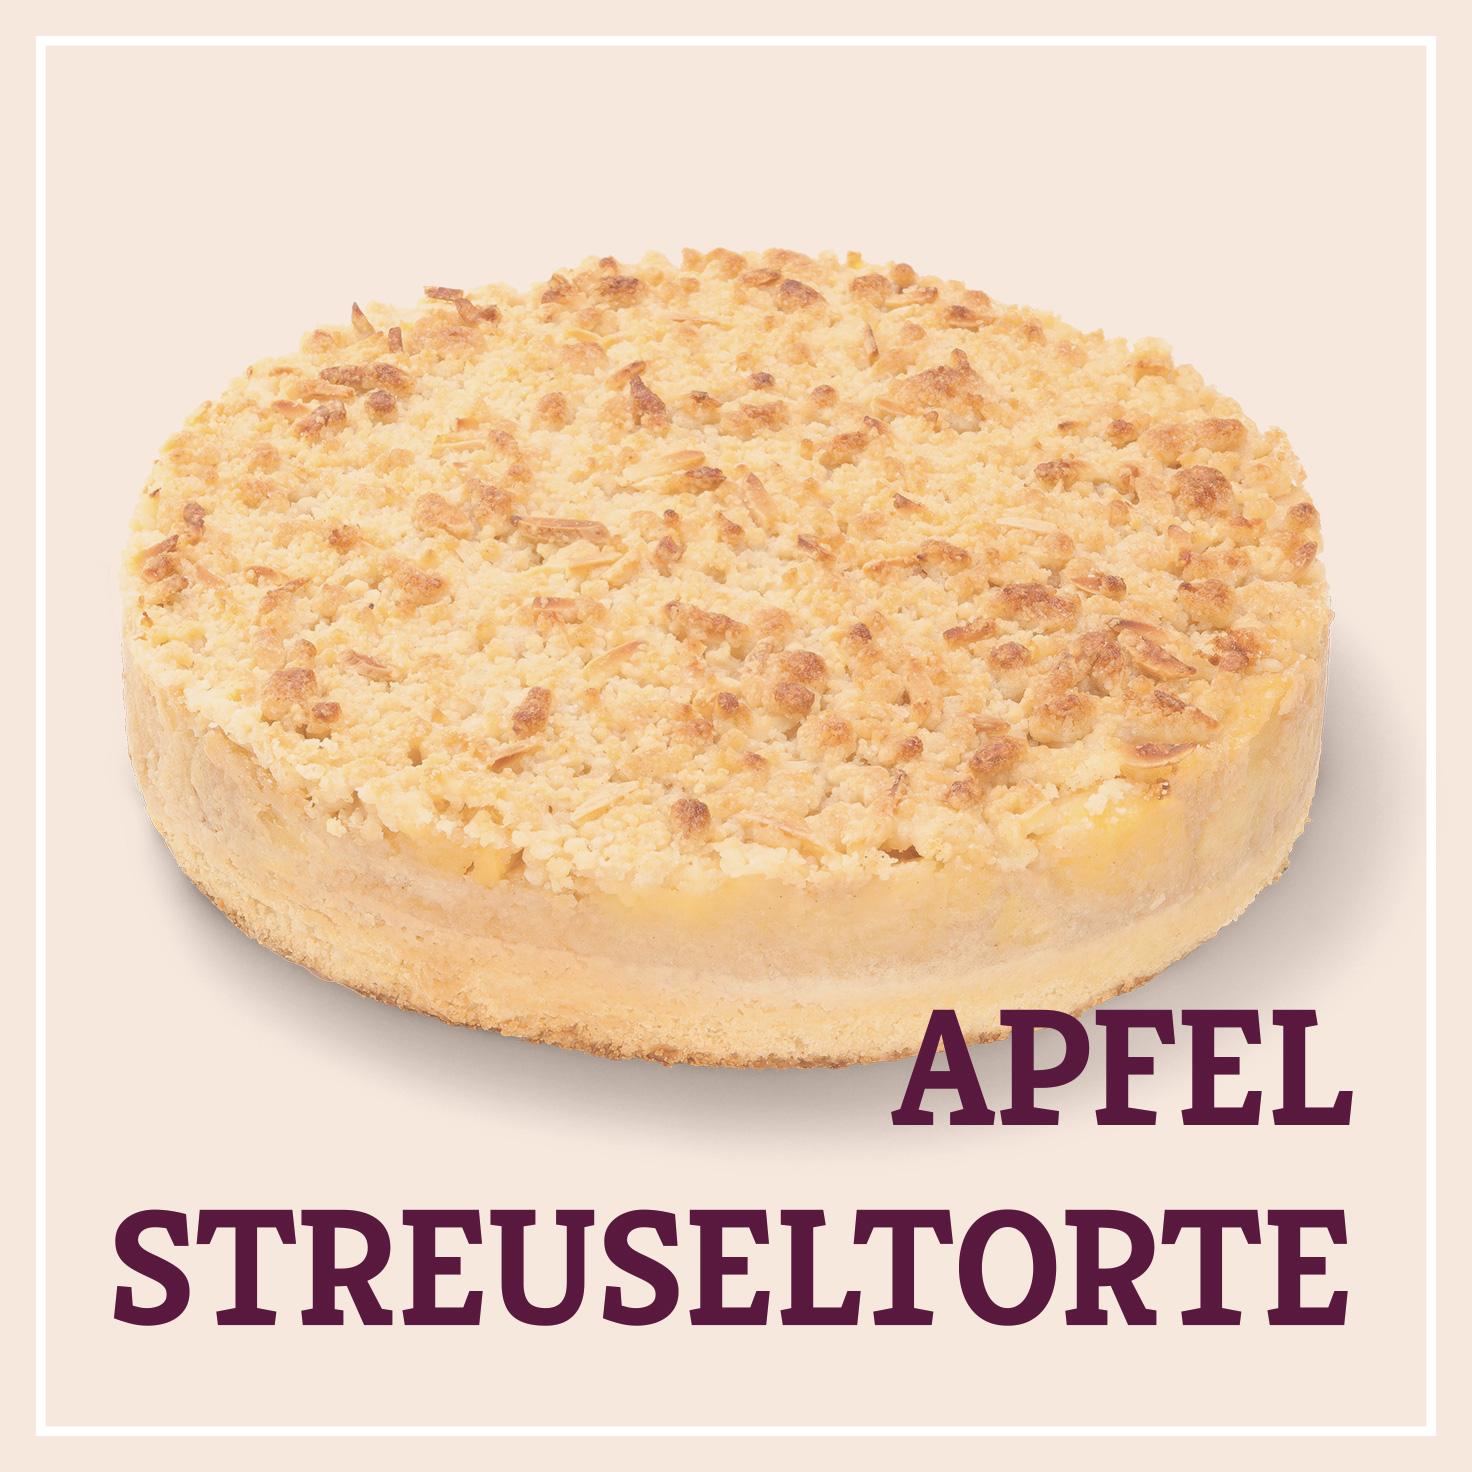 Heiss & Süß - Apfel Streuseltorte